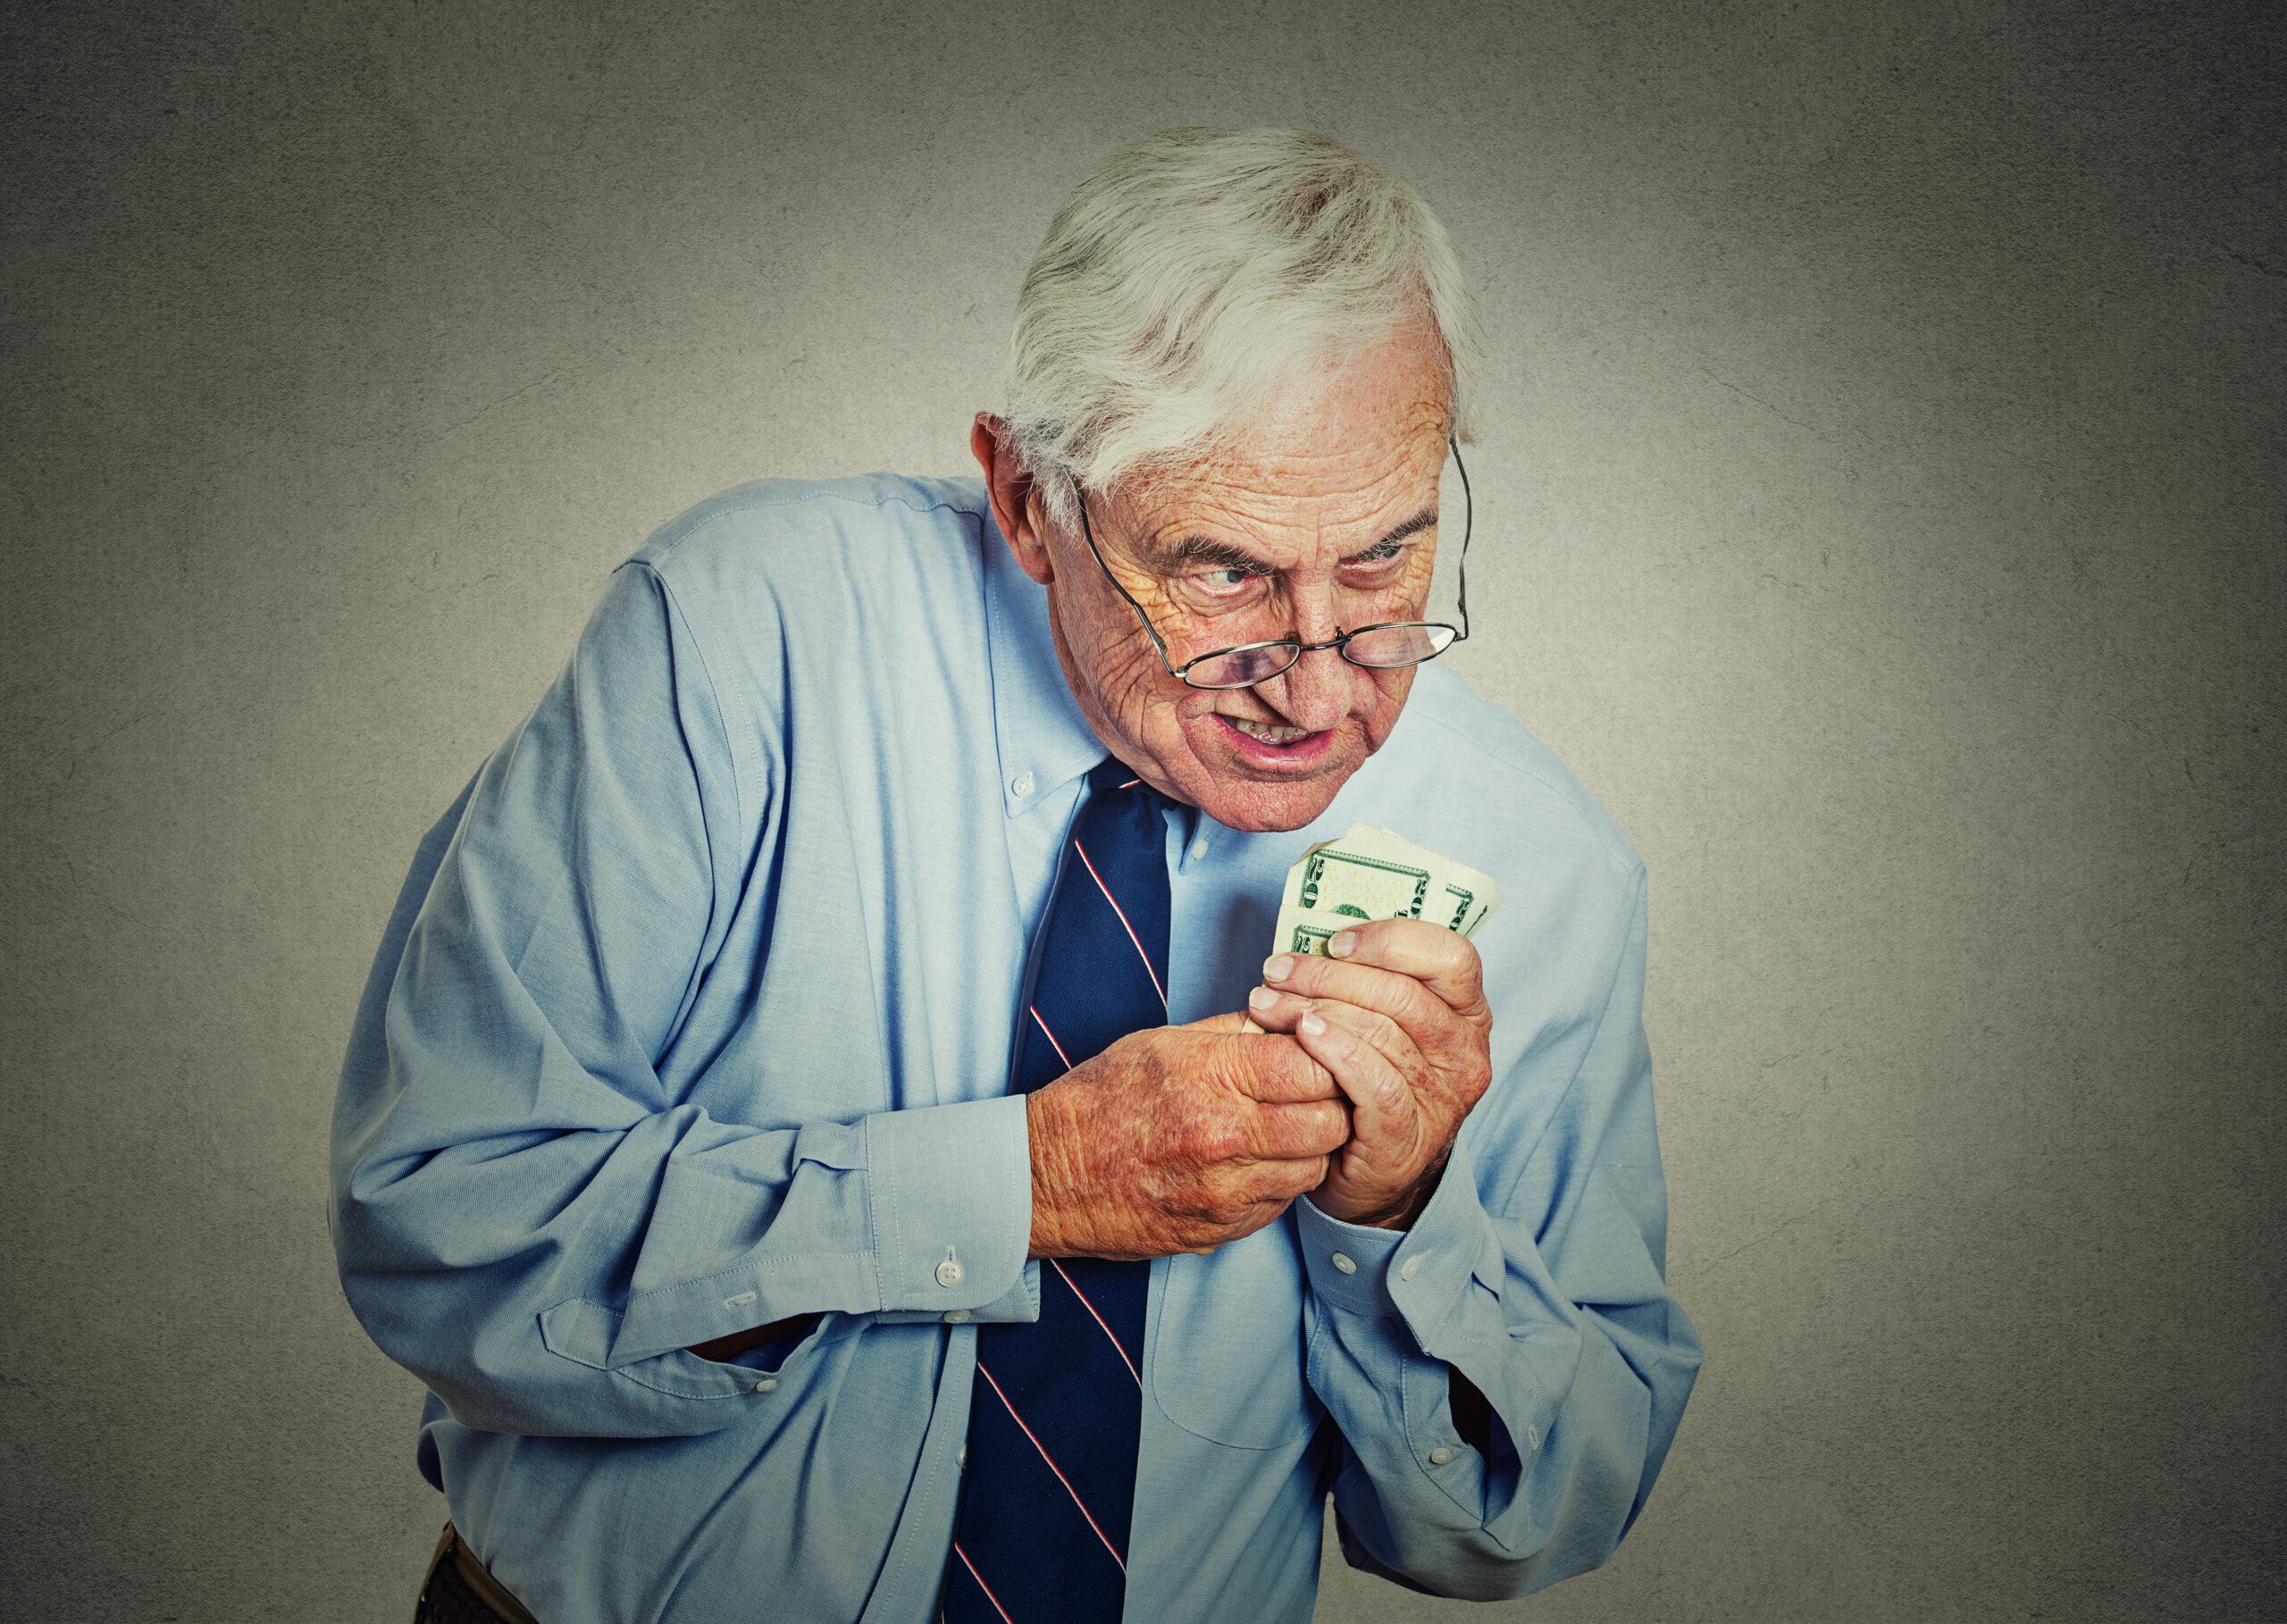 greedy executive, CEO, boss mature man holding dollar banknotes